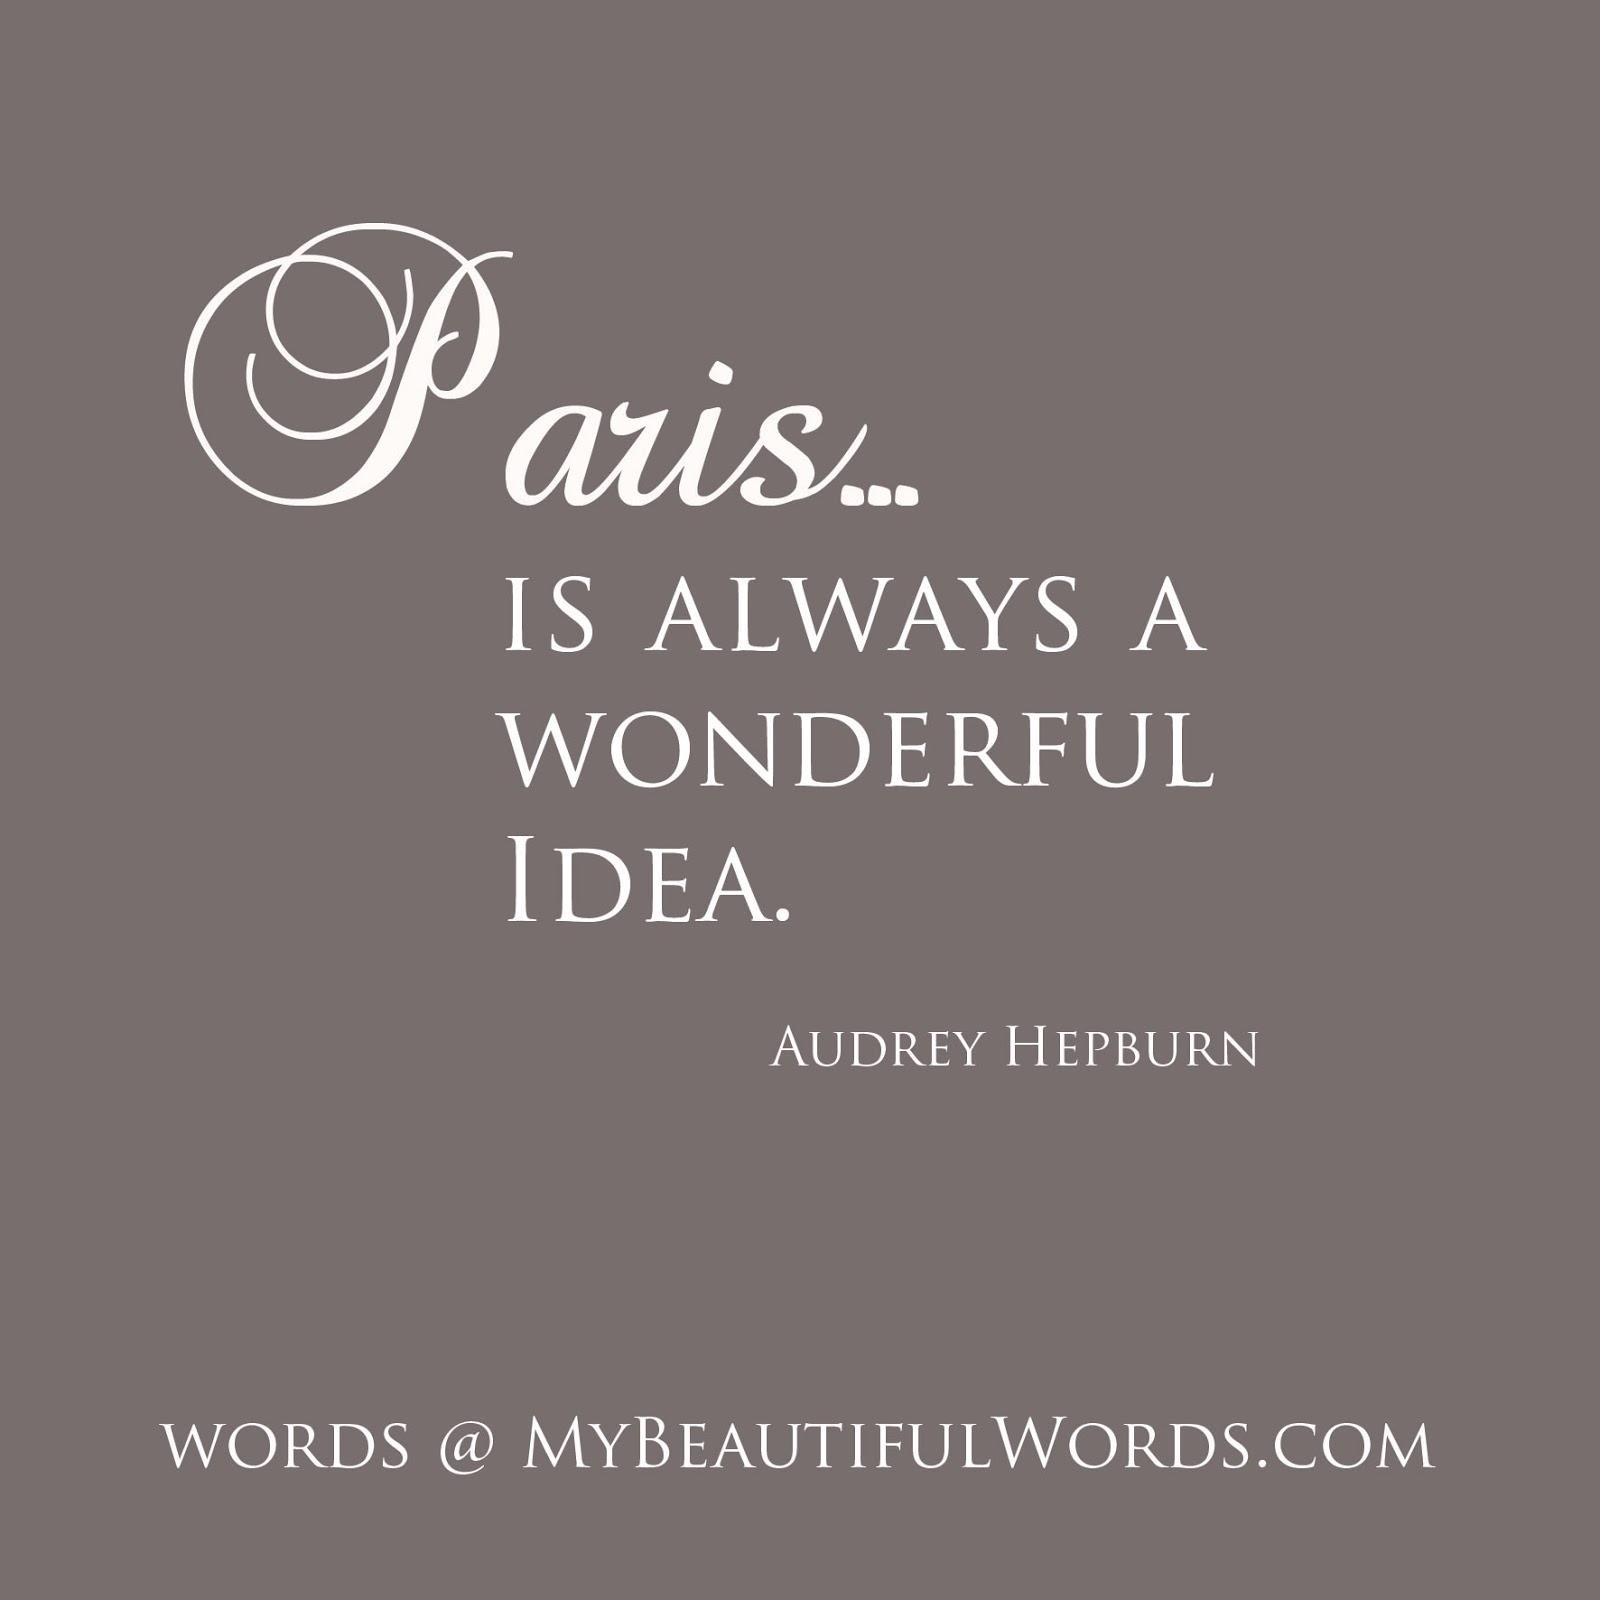 http://1.bp.blogspot.com/-xeDoNvtlreE/UJQ_qqupDPI/AAAAAAAAAr4/JAxbEa9n87k/s1600/Audrey+Hepburn+-+Paris.jpg